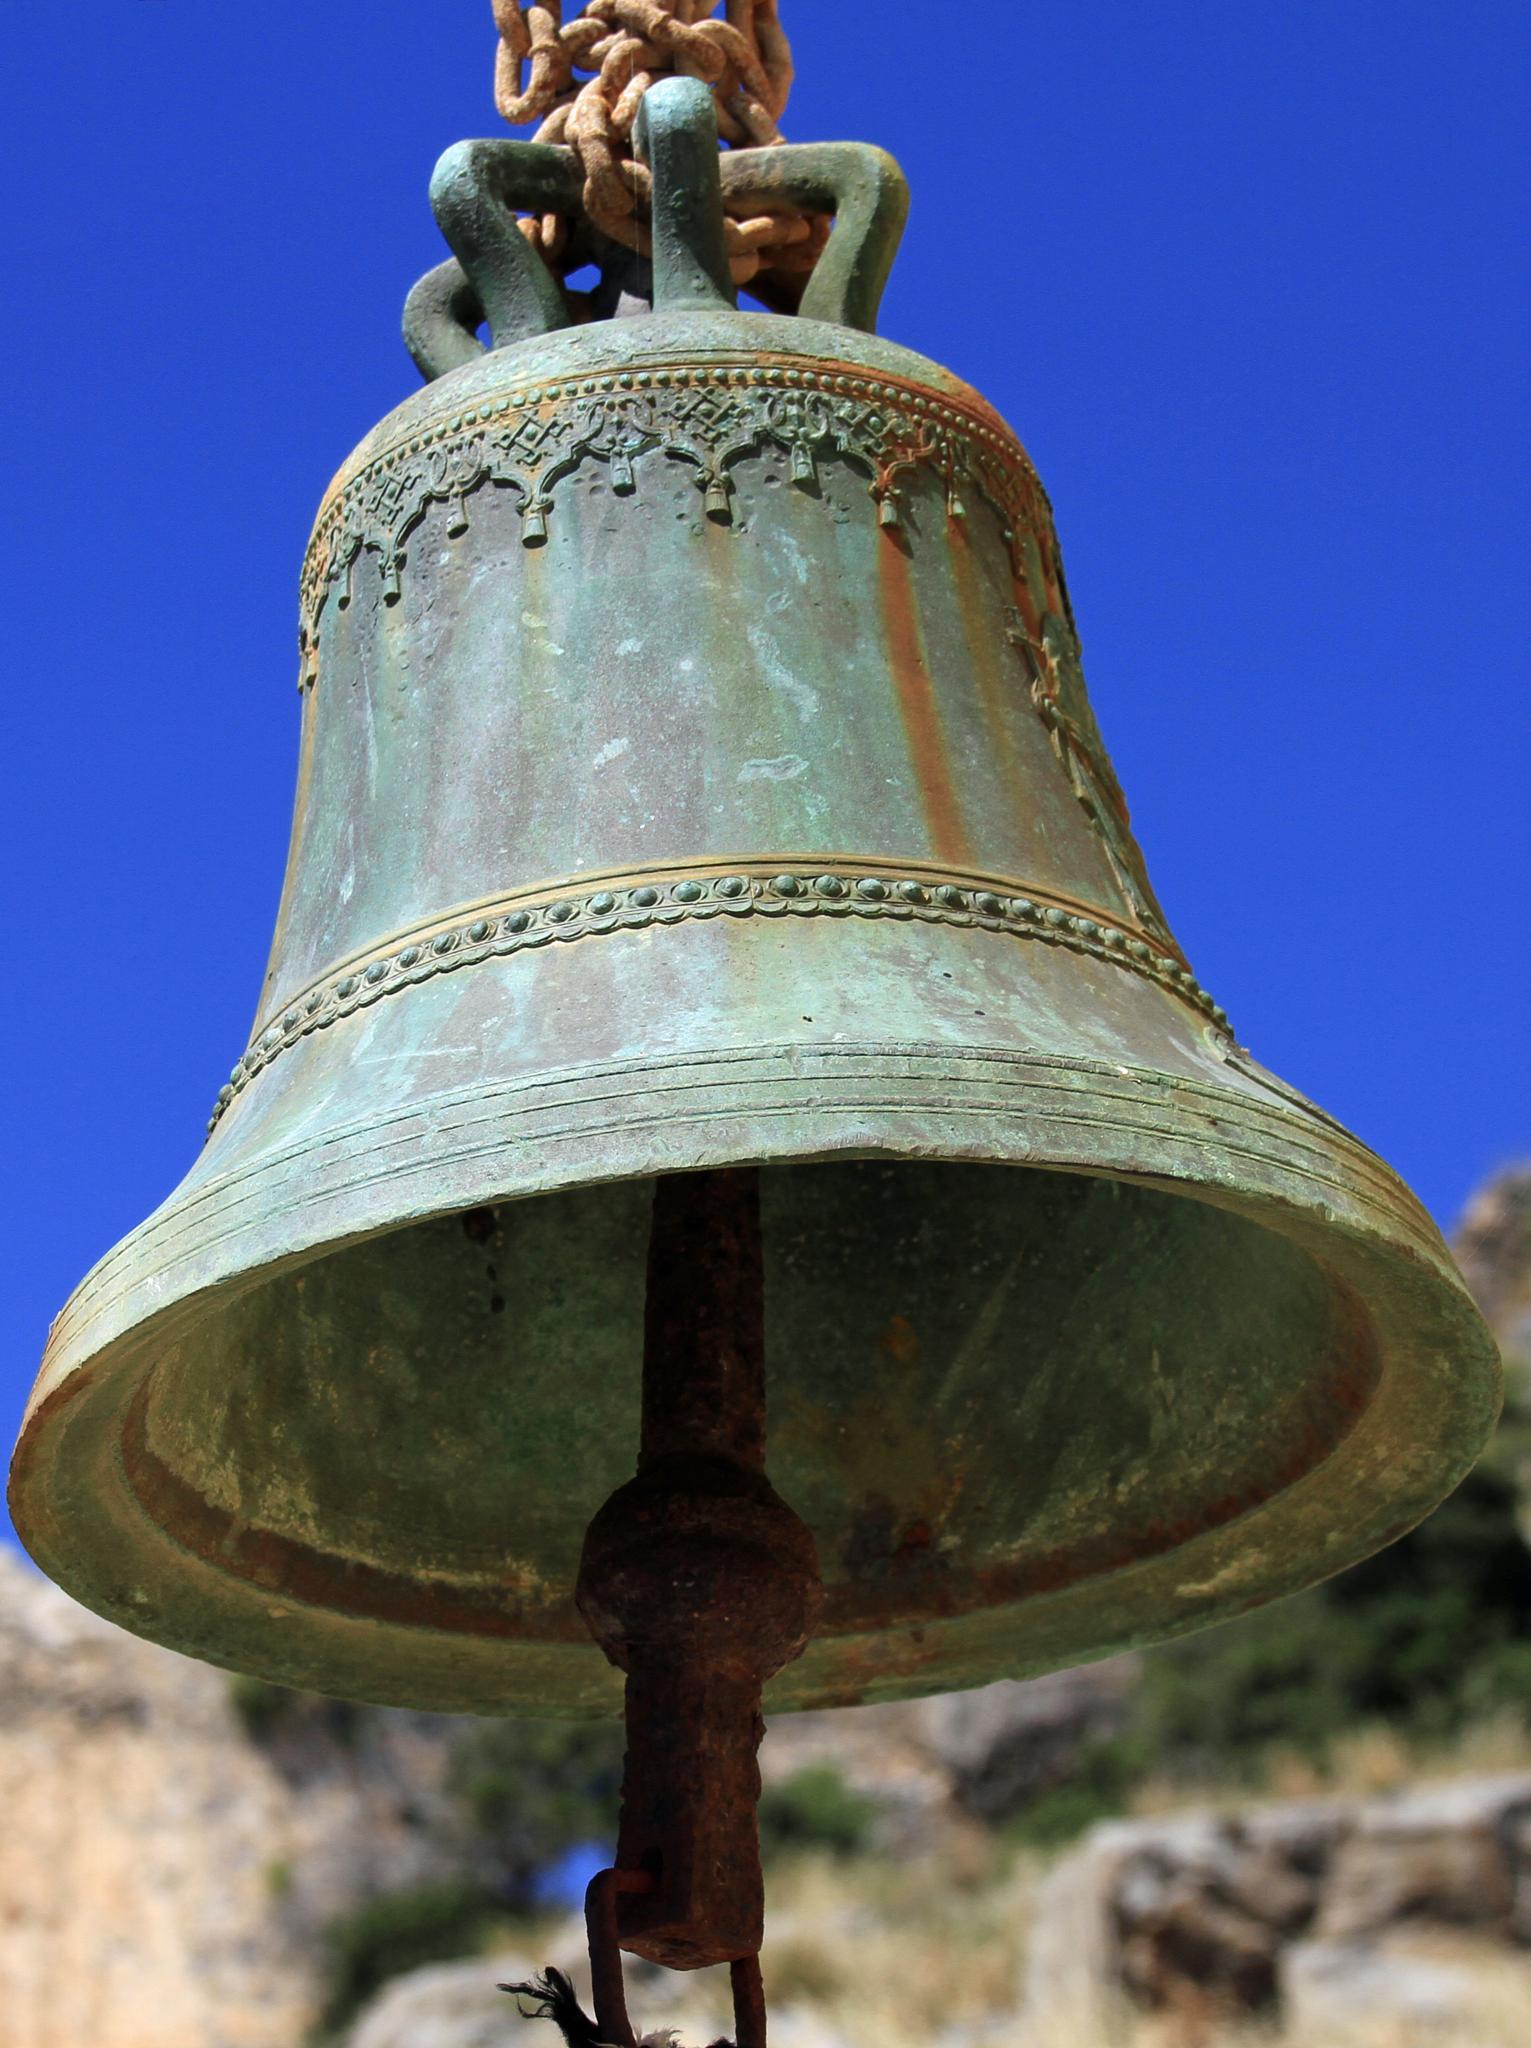 Church Bell by Martin Roper